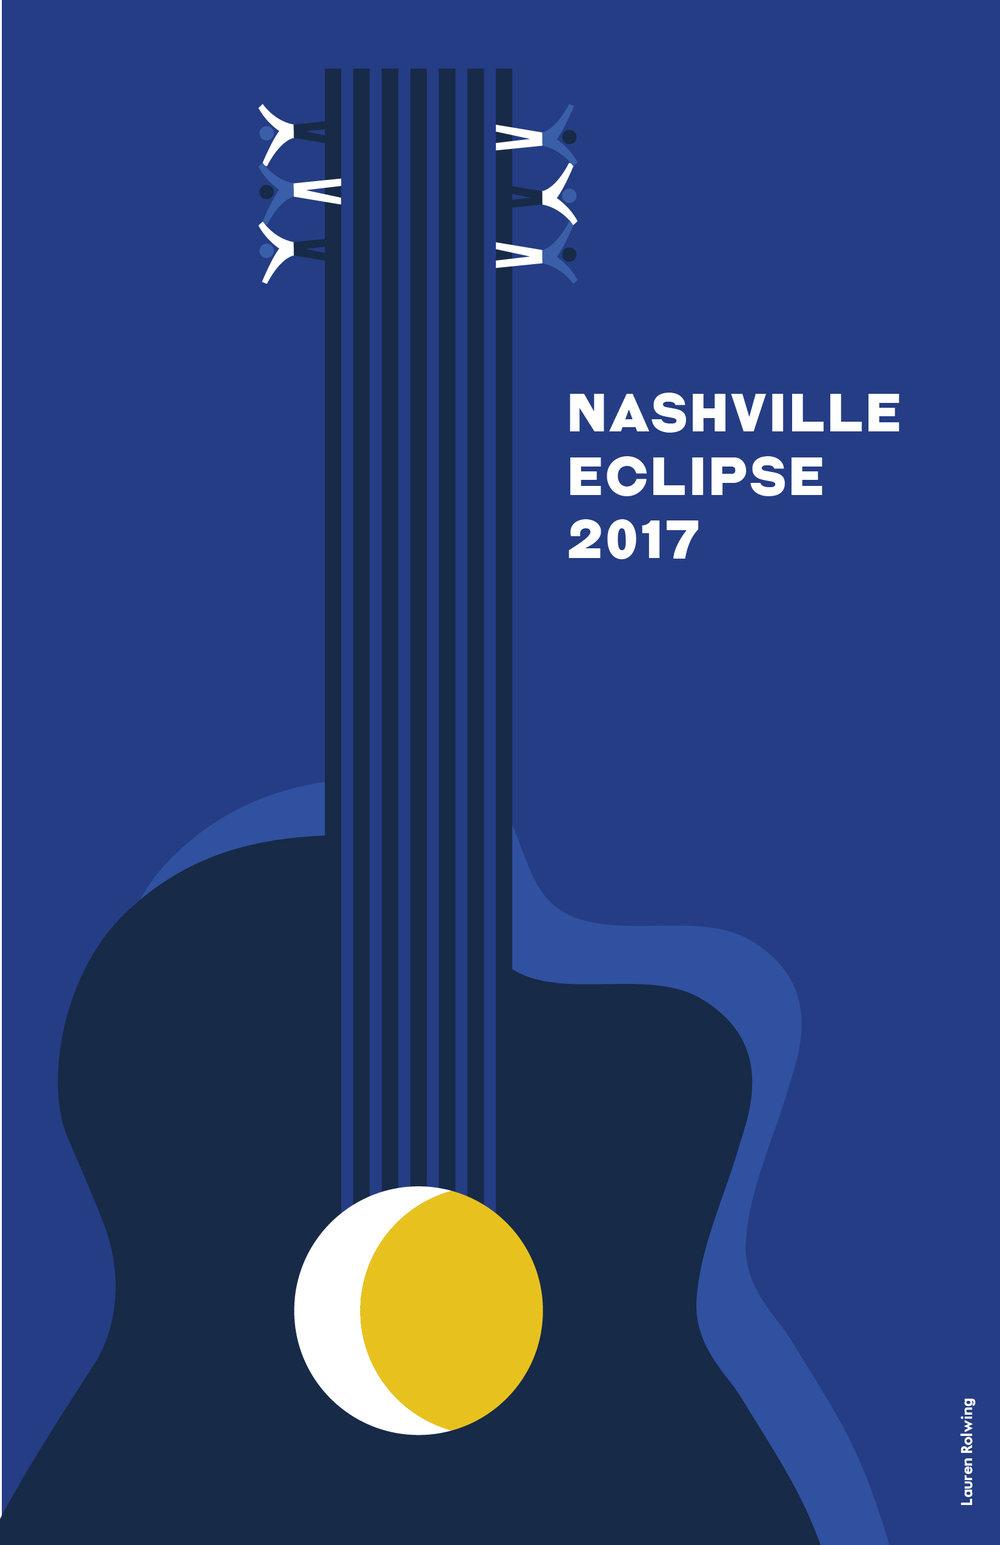 eclipseLaurenRolwing-02.jpg